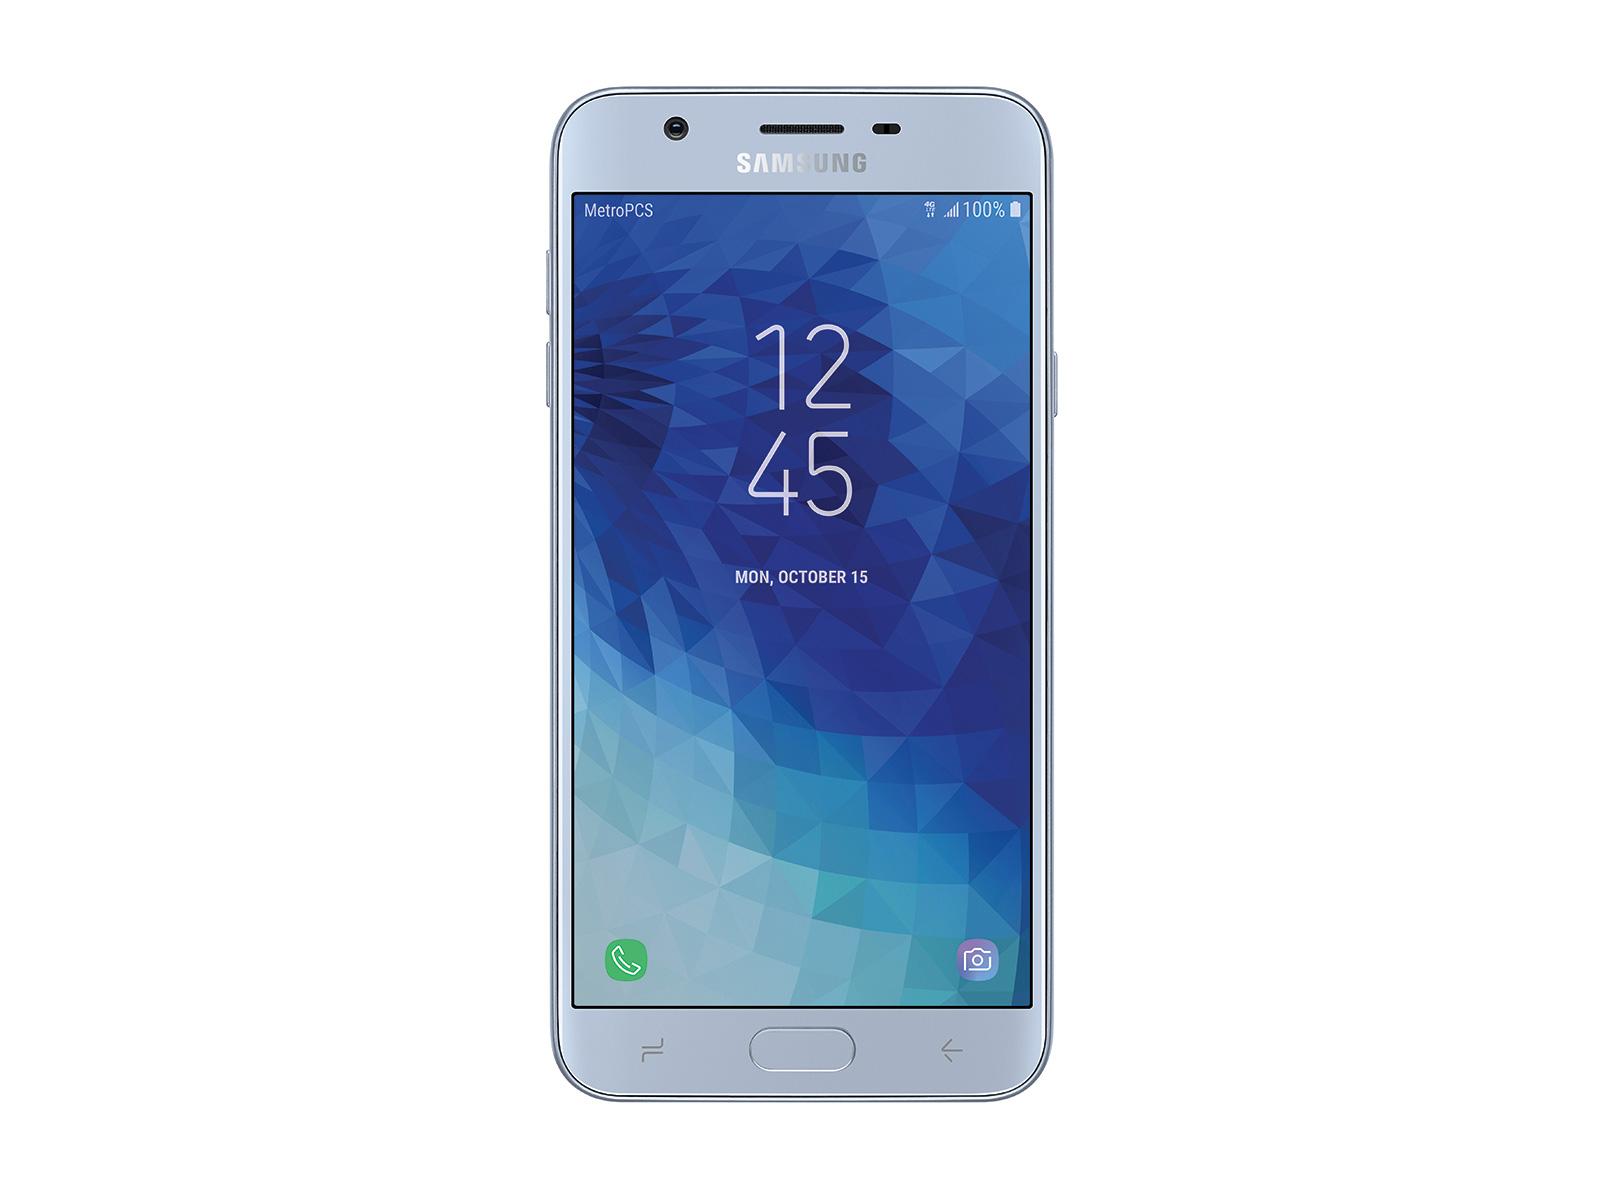 Galaxy J7 Star (MetroPCS) Phones - SM